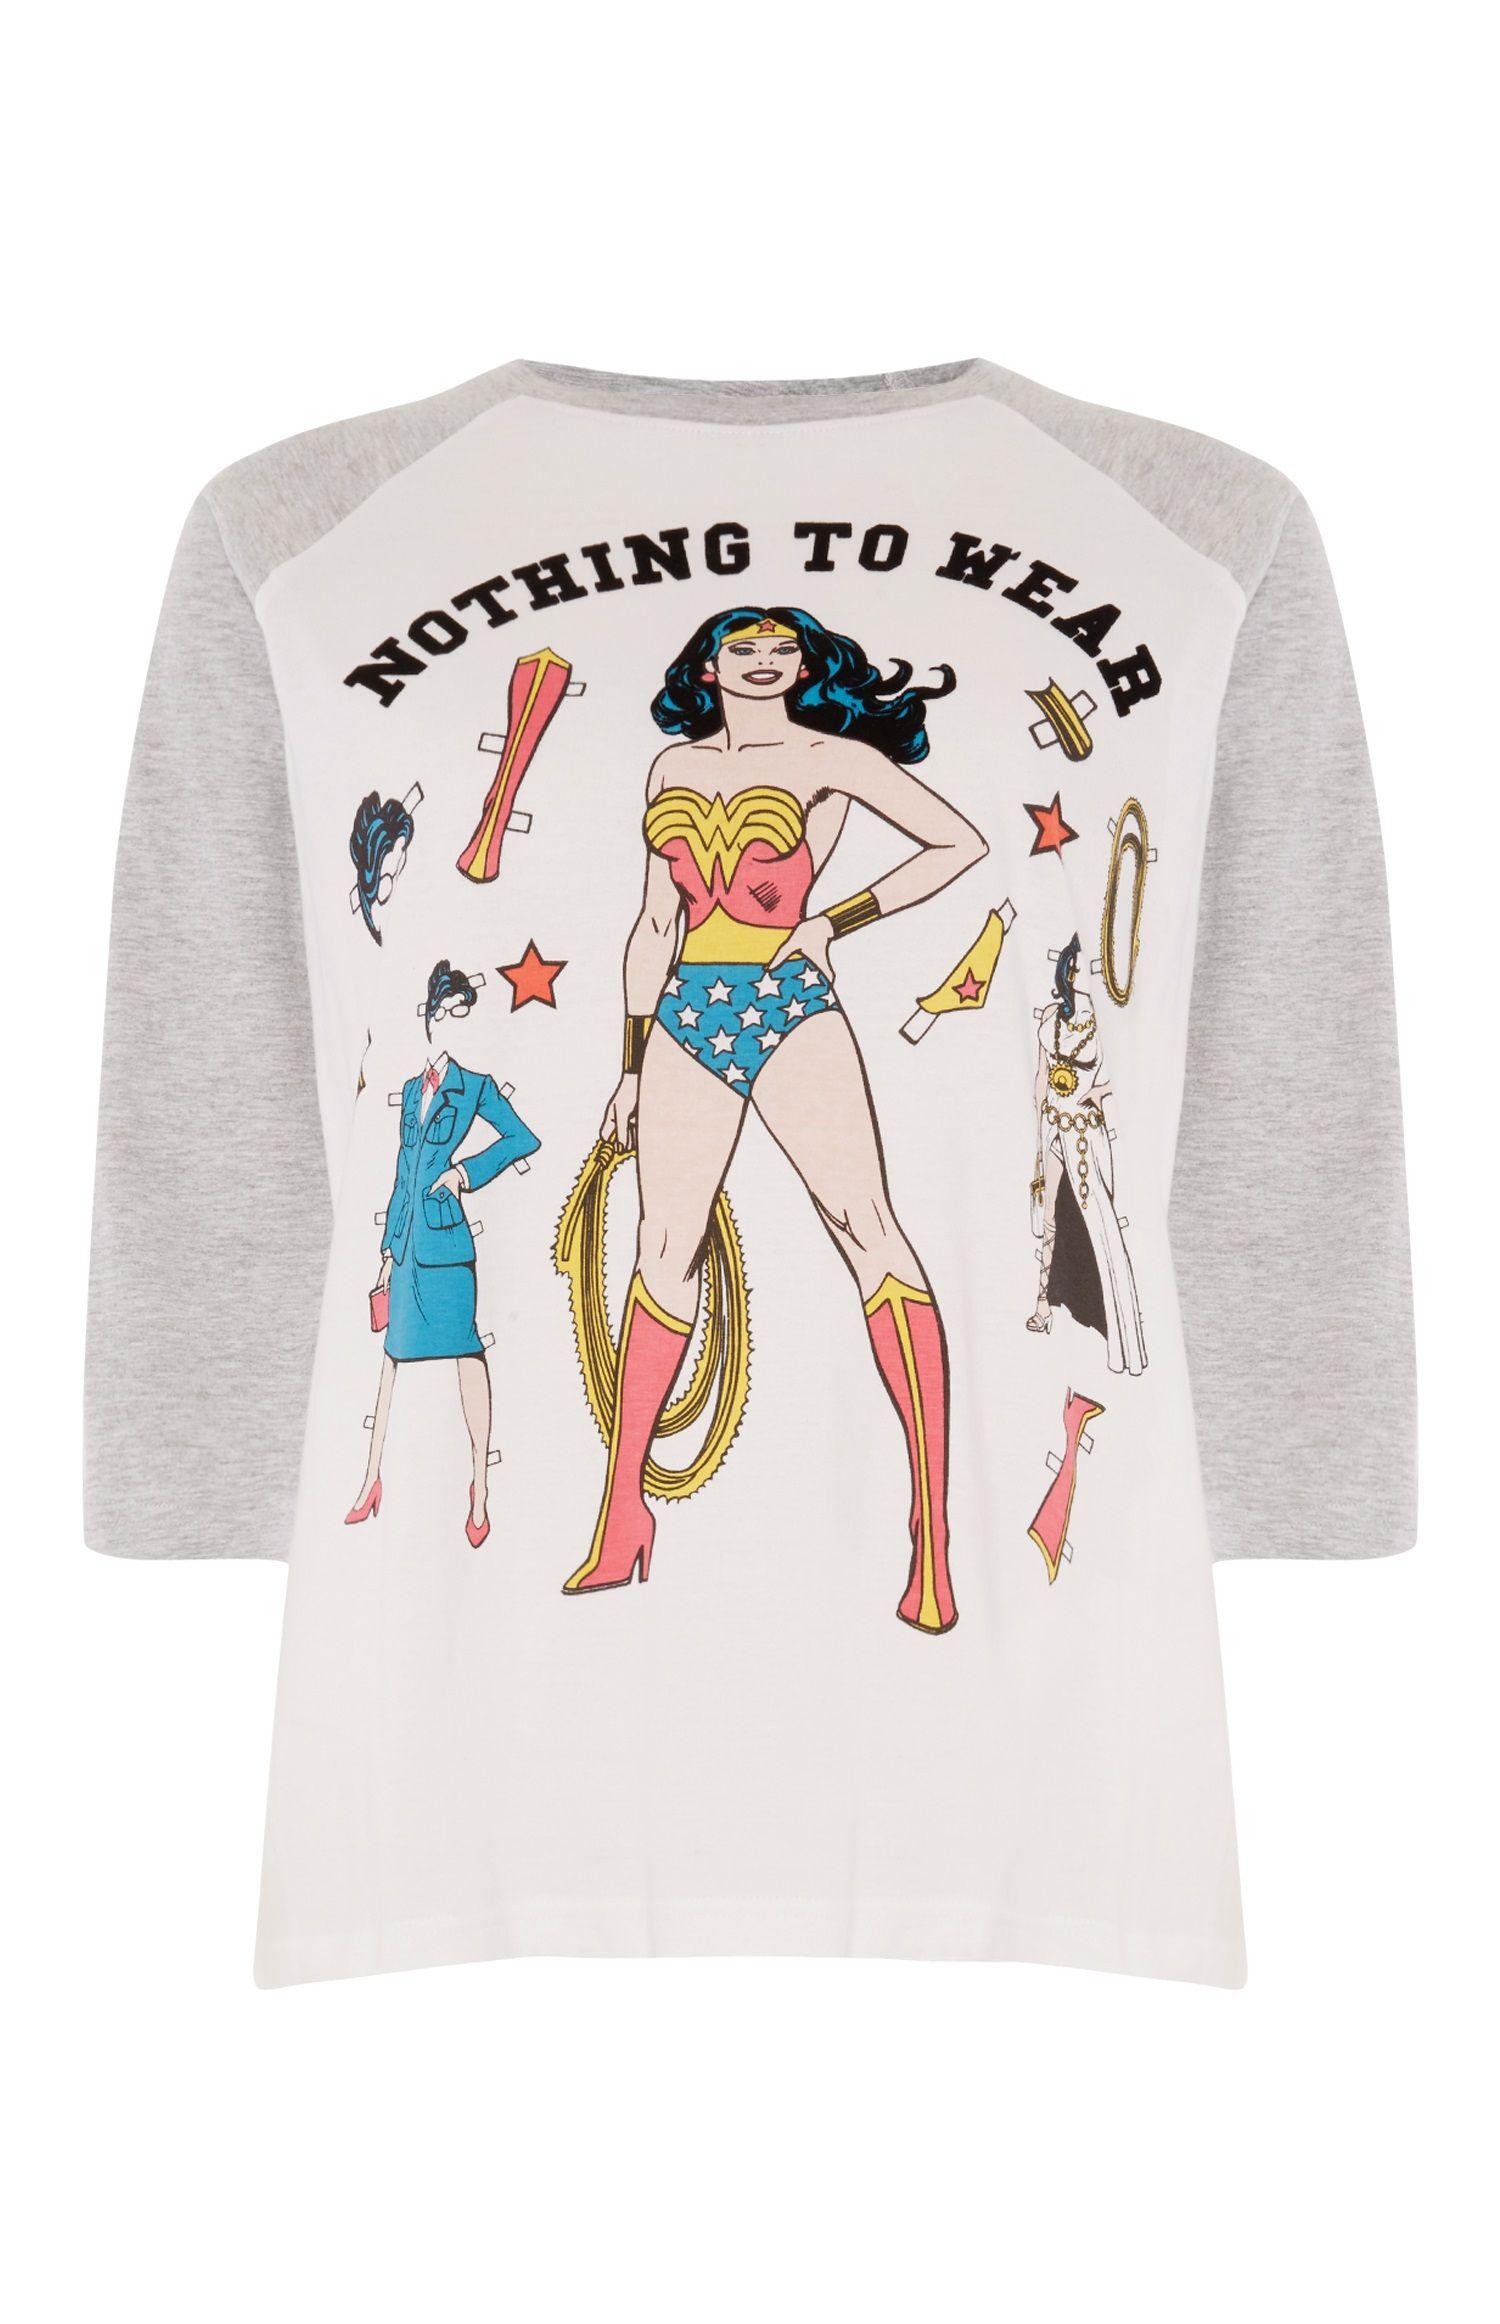 Primark Women Batman Sweatshirt womens Jumper